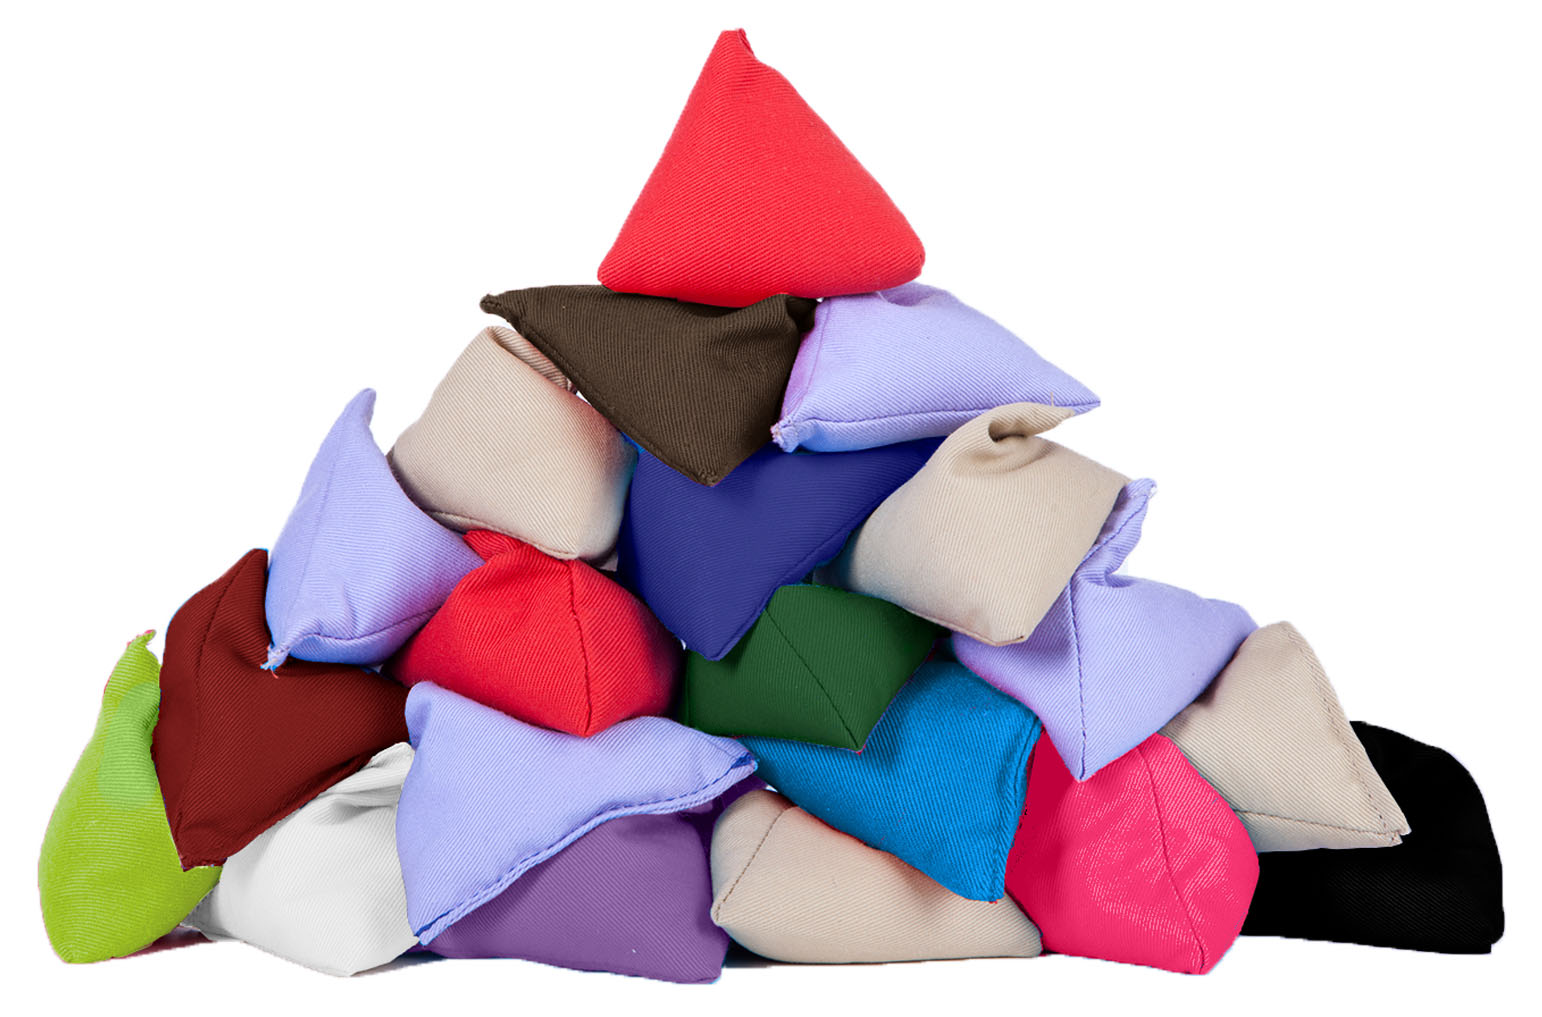 Multipacks Juggling Pyramid Bean Bags Practice Throwing Catching